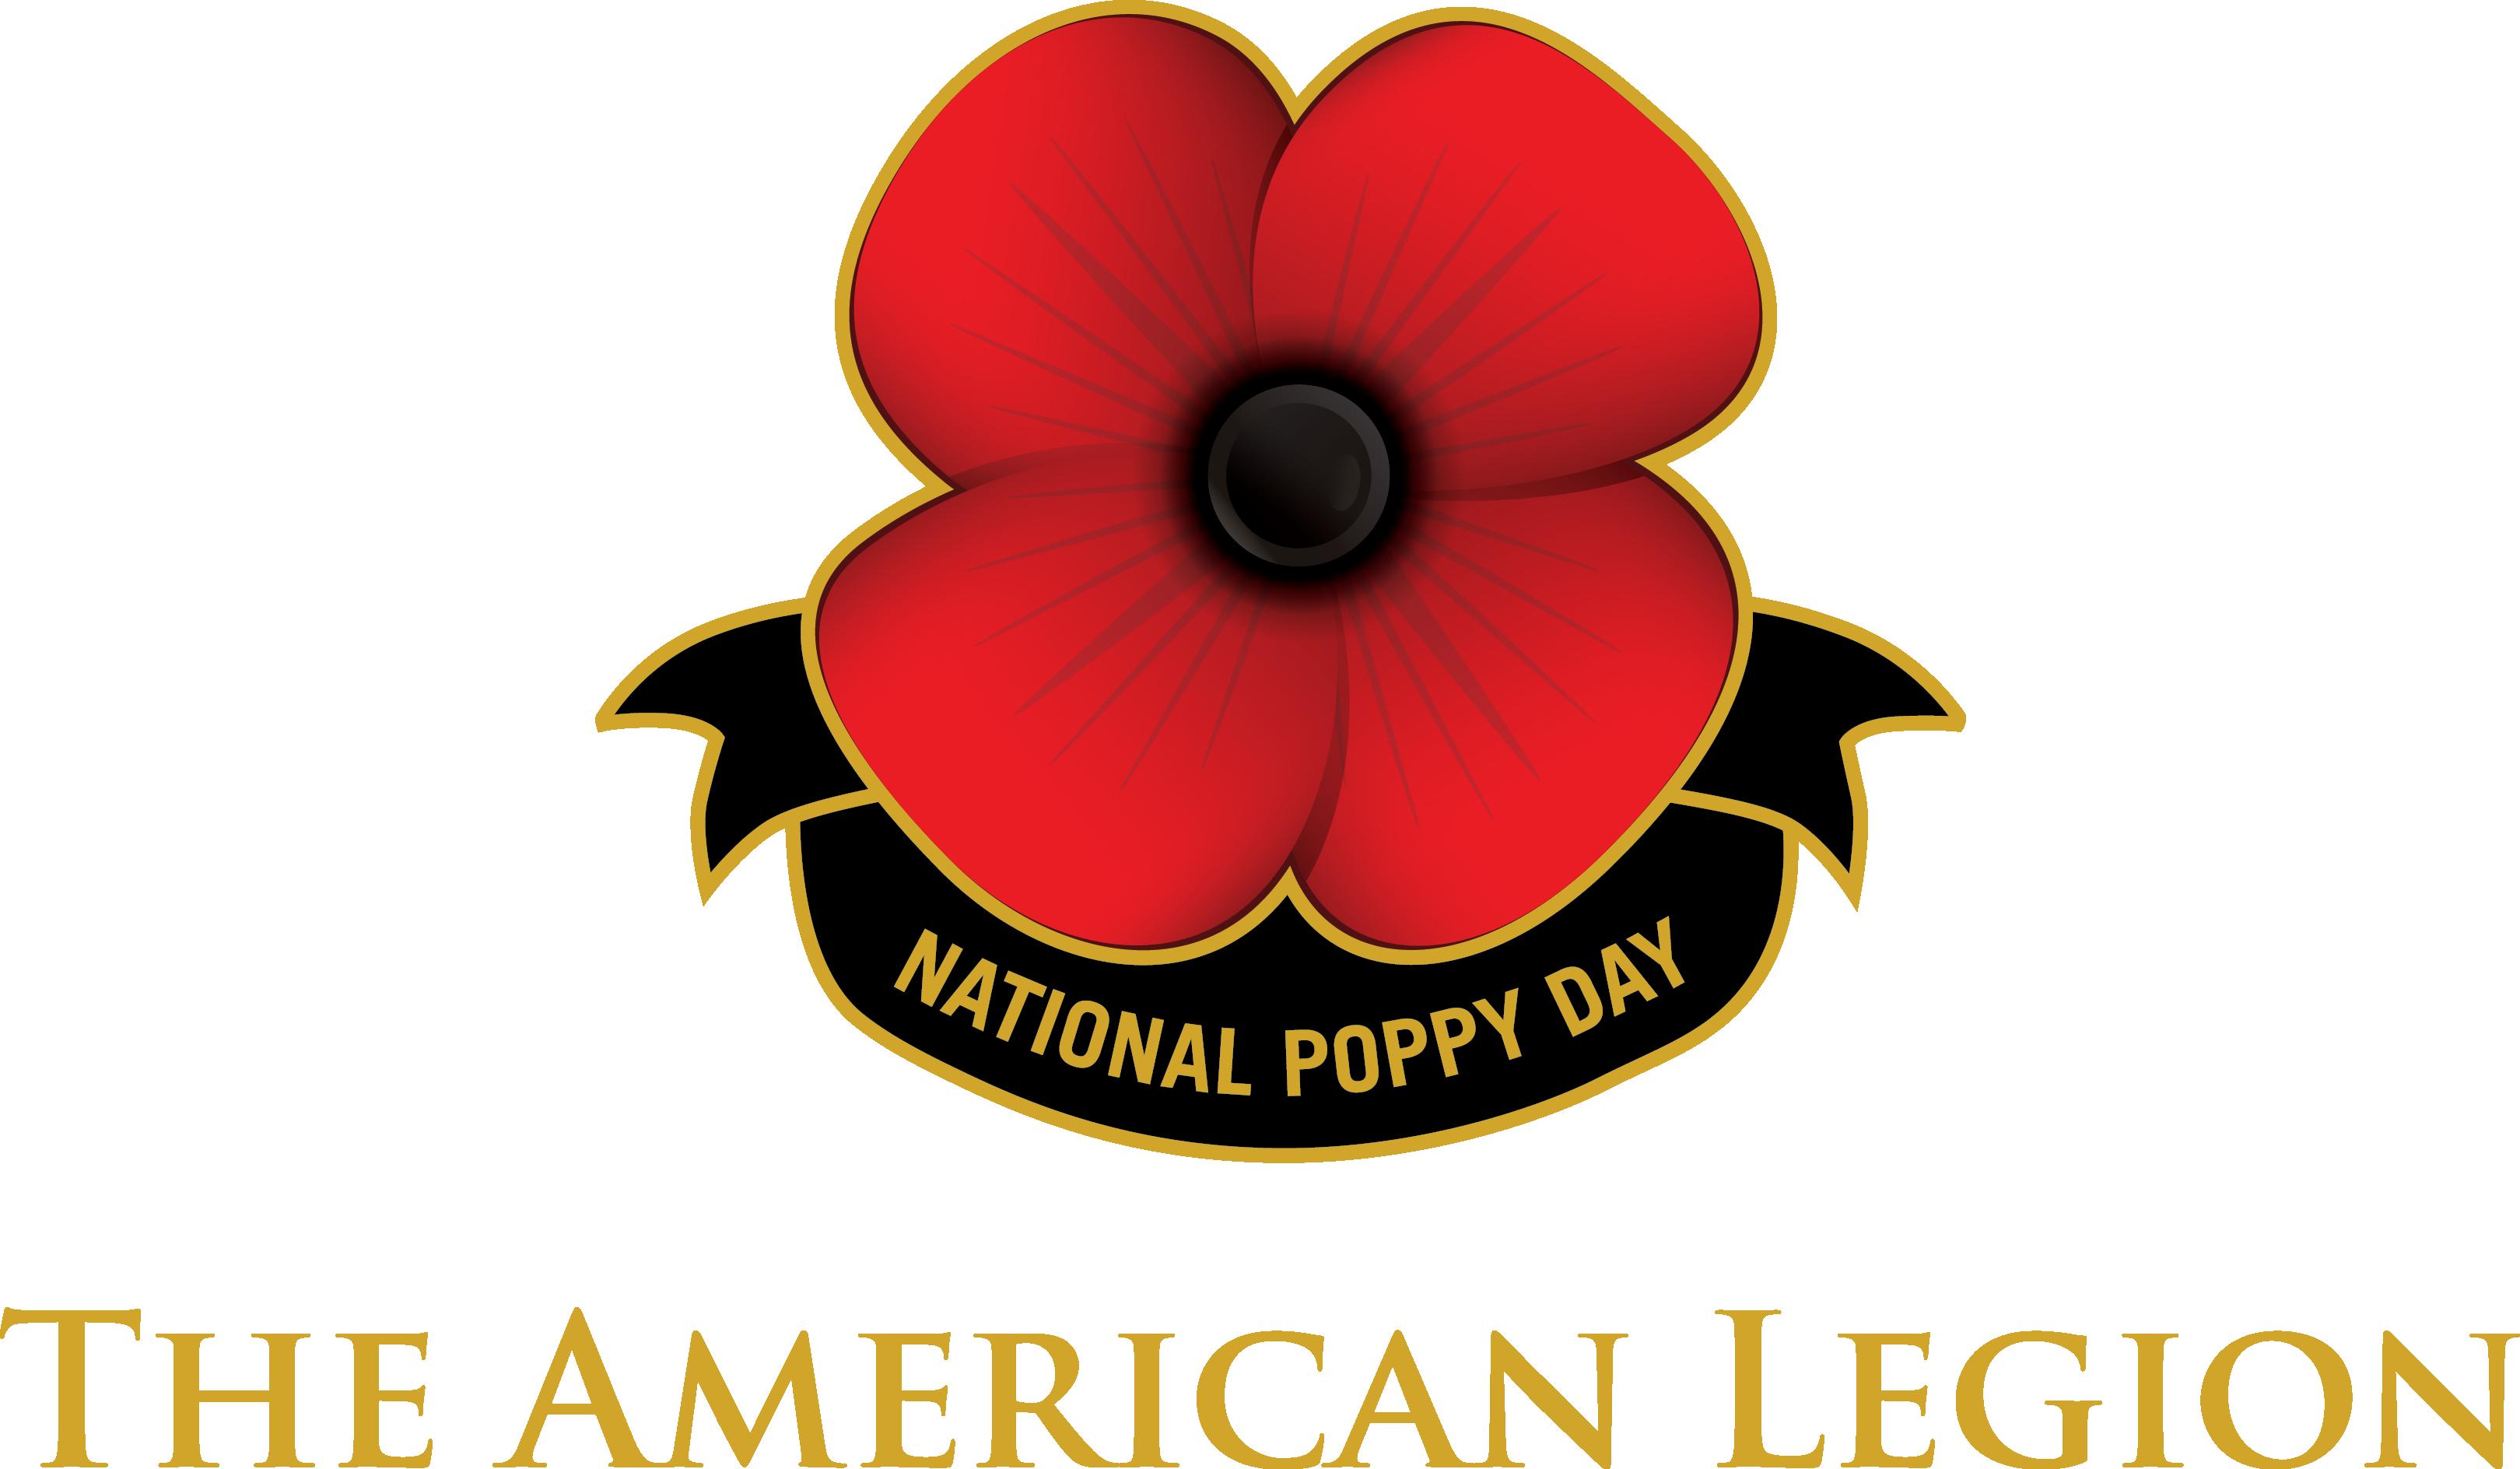 poppy day logos the american legion american legion riders loganville american legion riders loganville